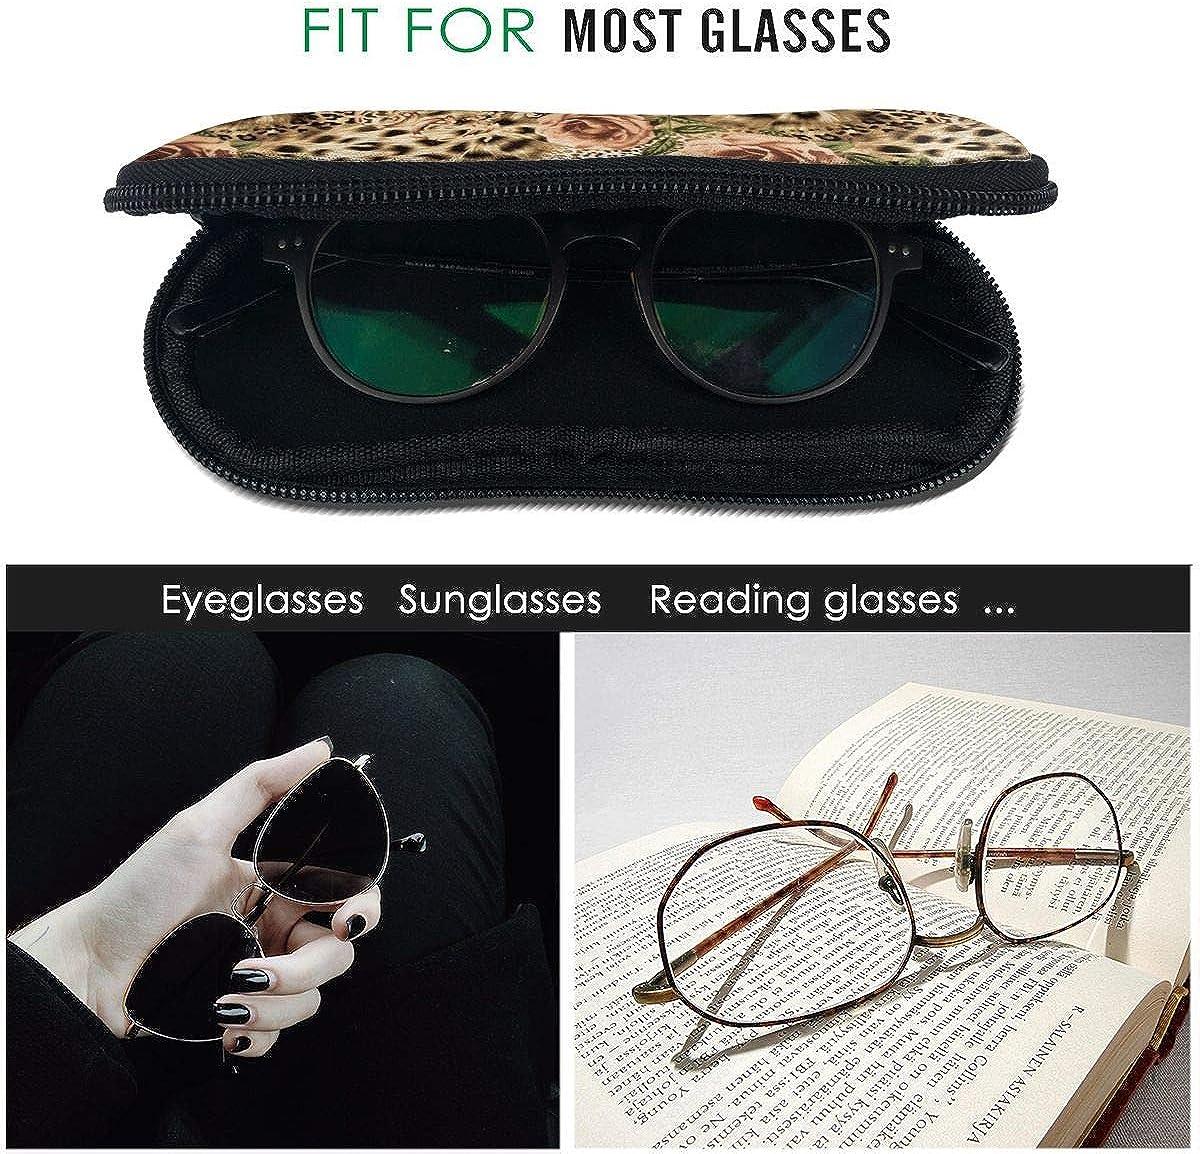 Striped Leopard Print Floral Sunglasses Soft Case Ultra Light Neoprene Zipper Eyeglass Case With Key Chain